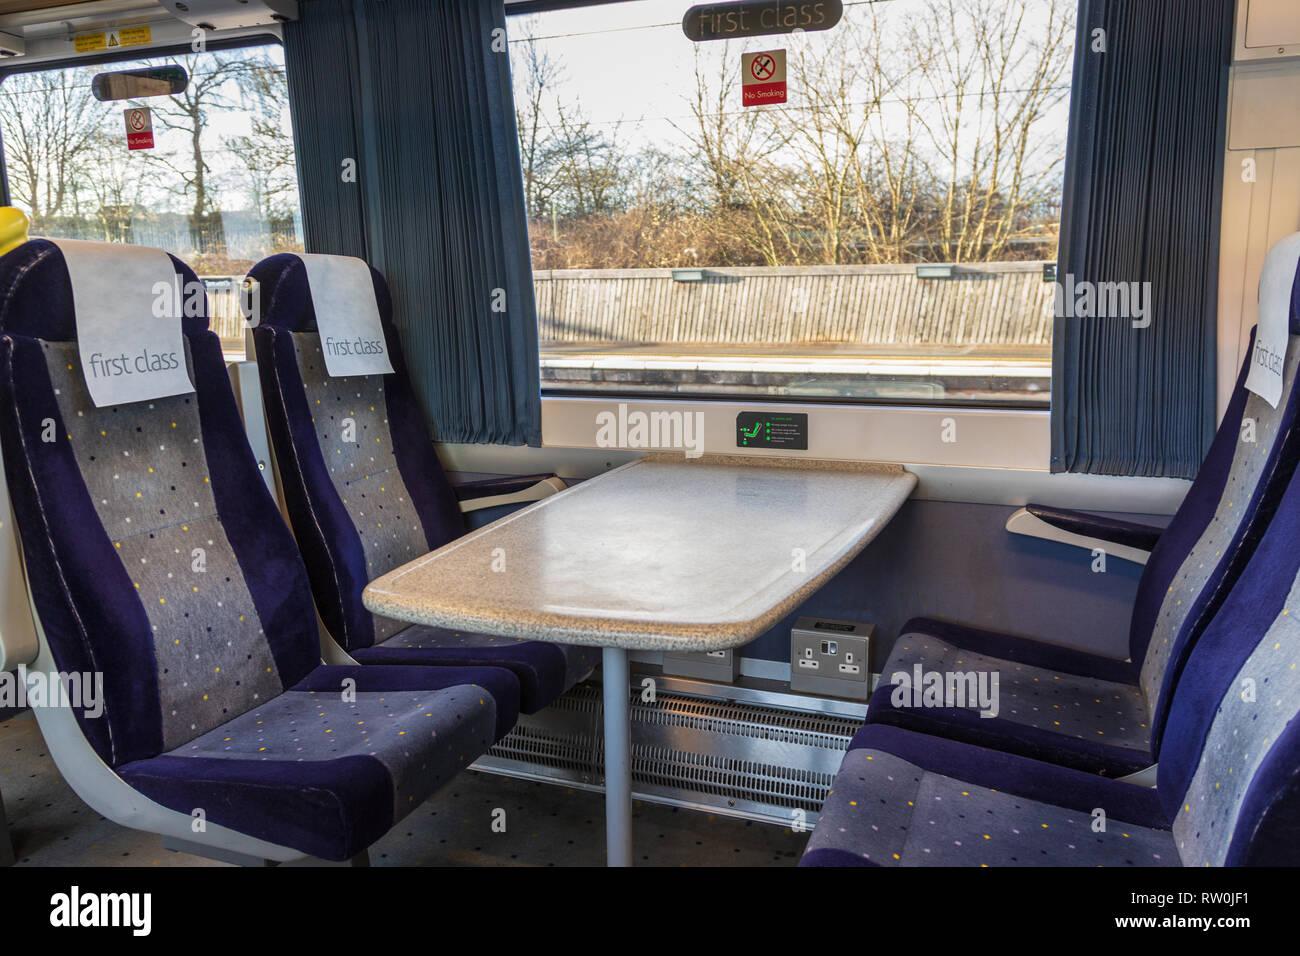 Empty Train Interior Stock Photos & Empty Train Interior Stock